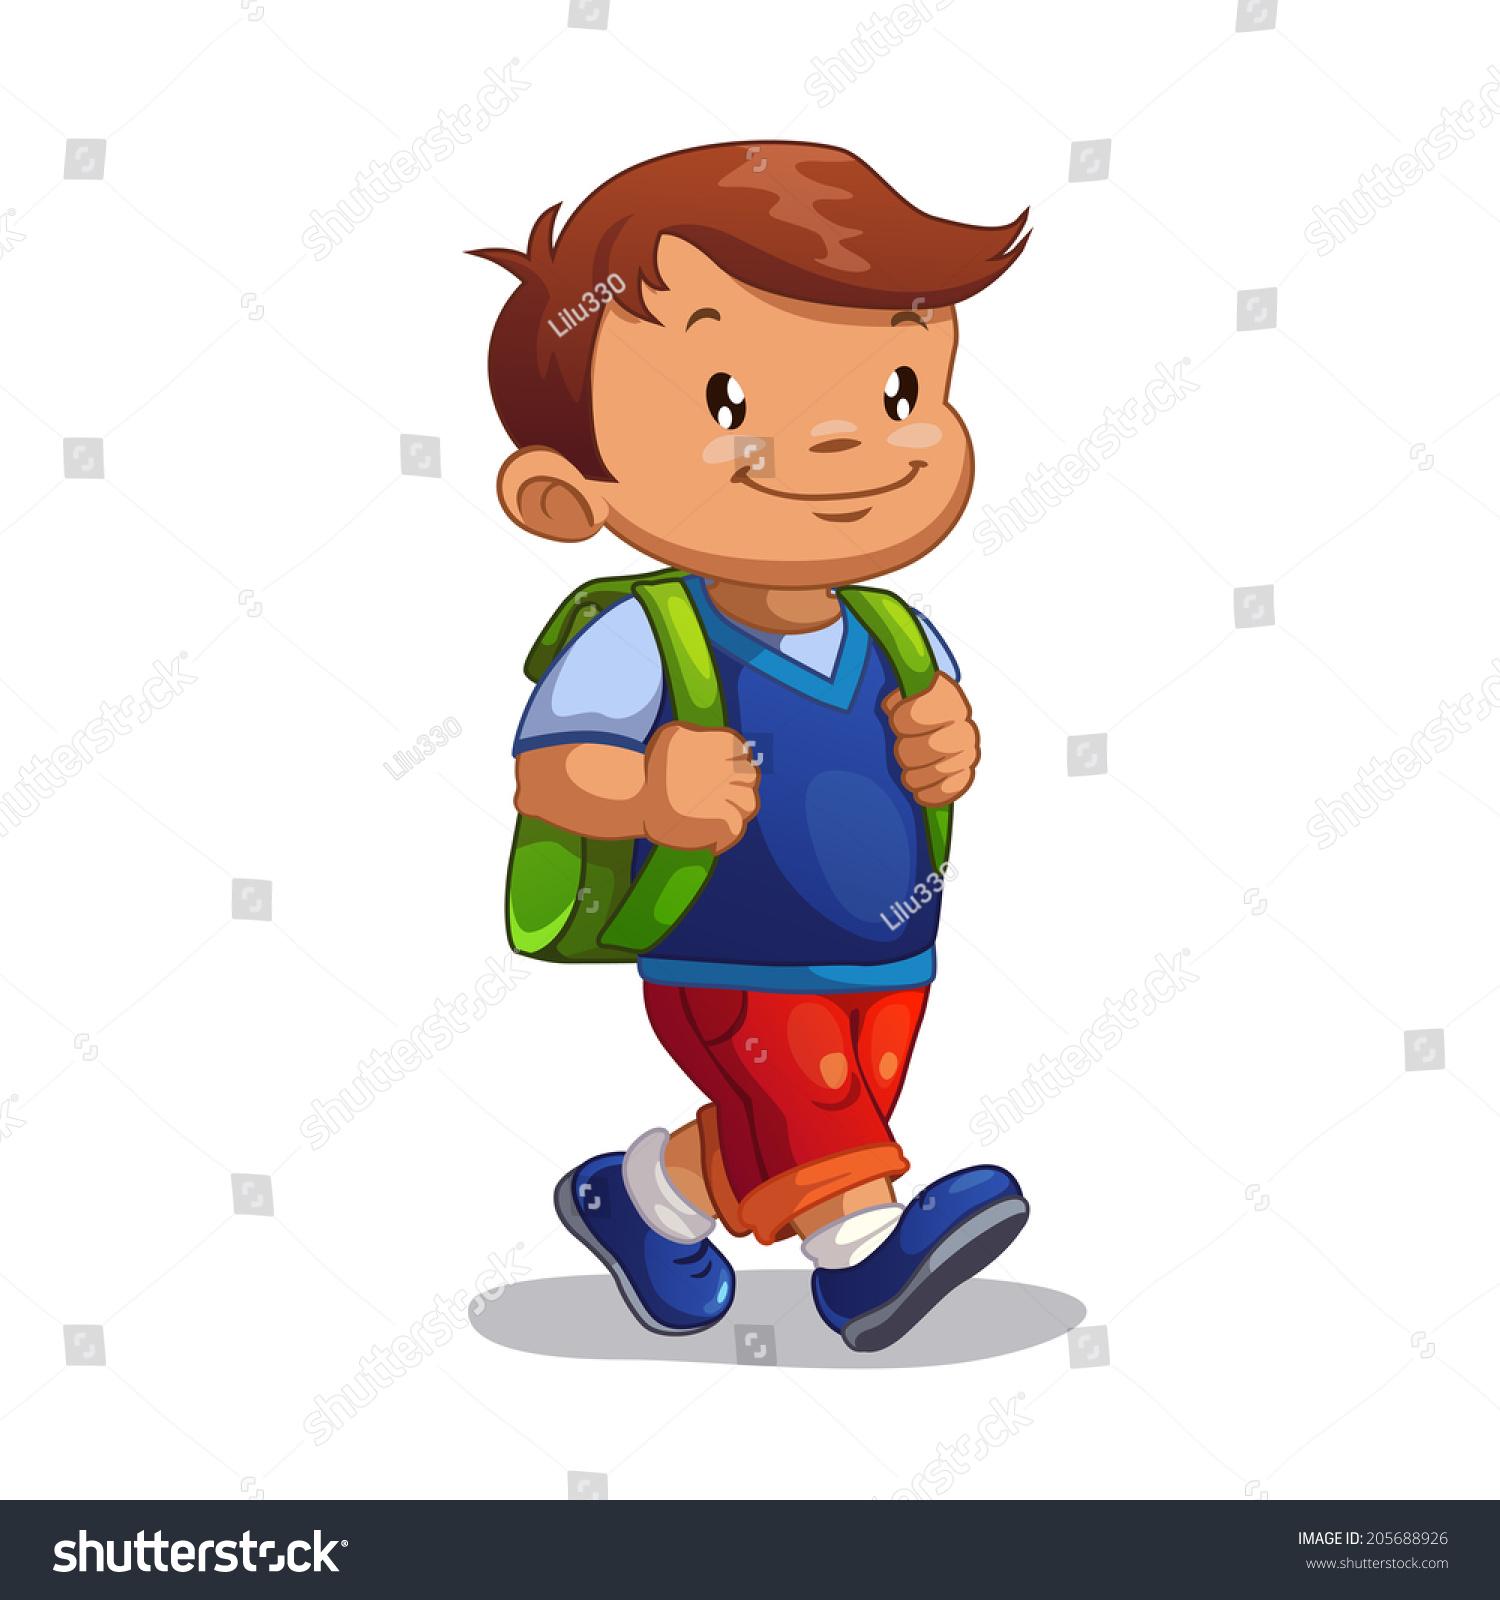 Cute Cartoon Boy Goes School Isolated Stock Vector 205688926 - Shutterstock-7789